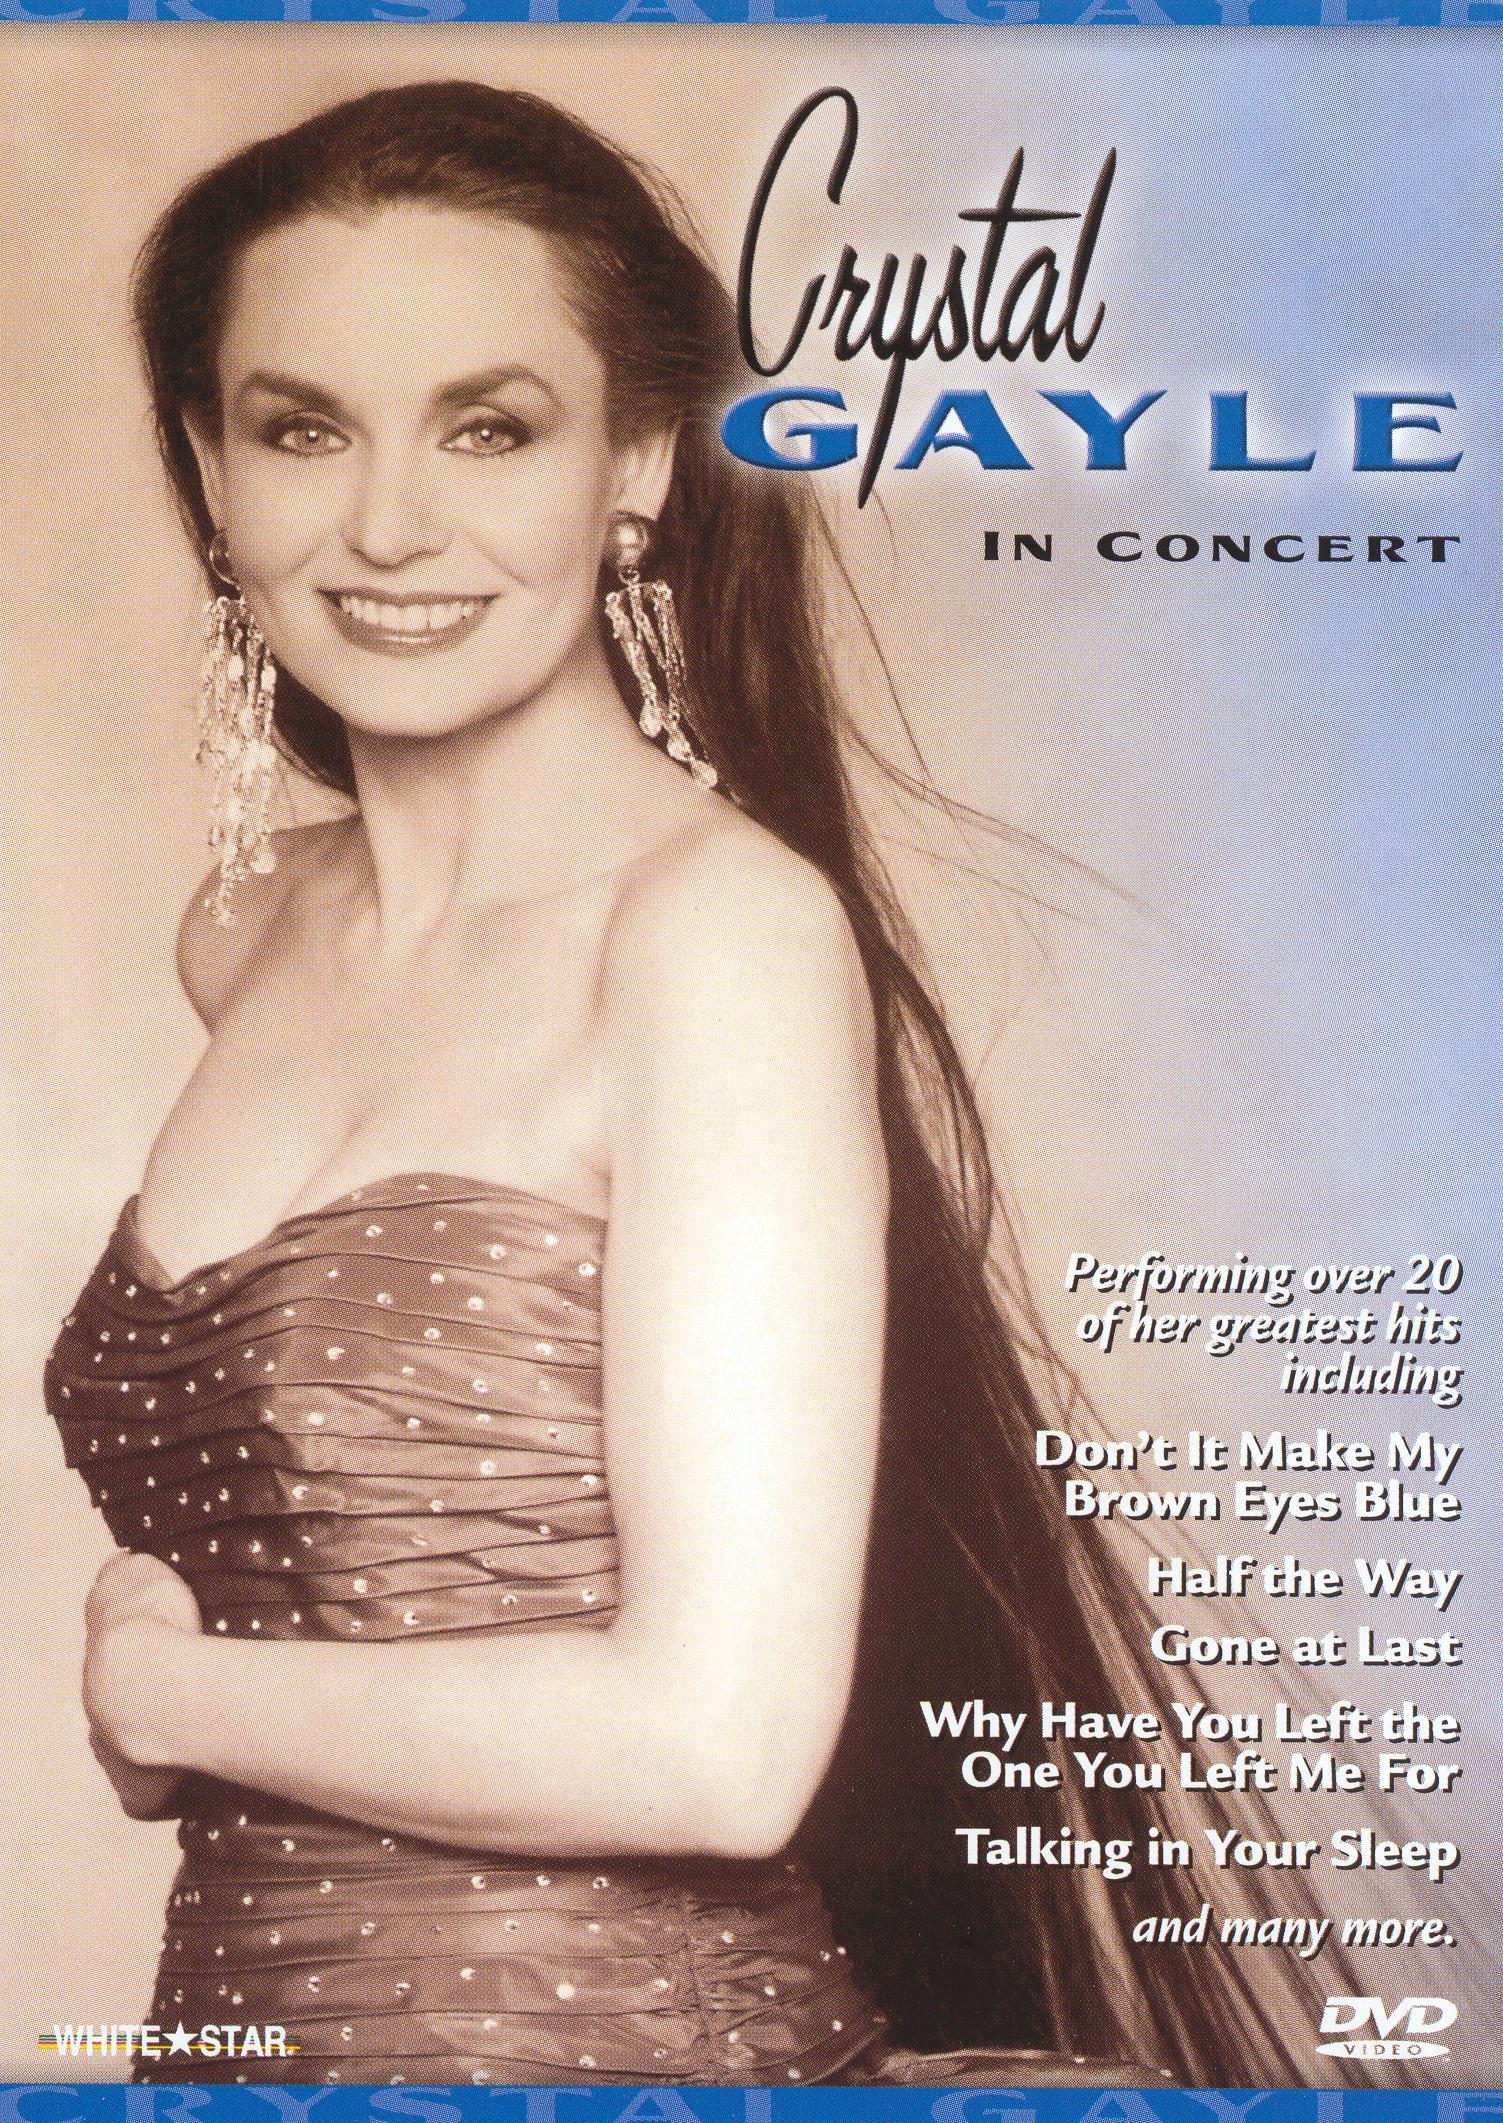 Crystal Gayle in Concert